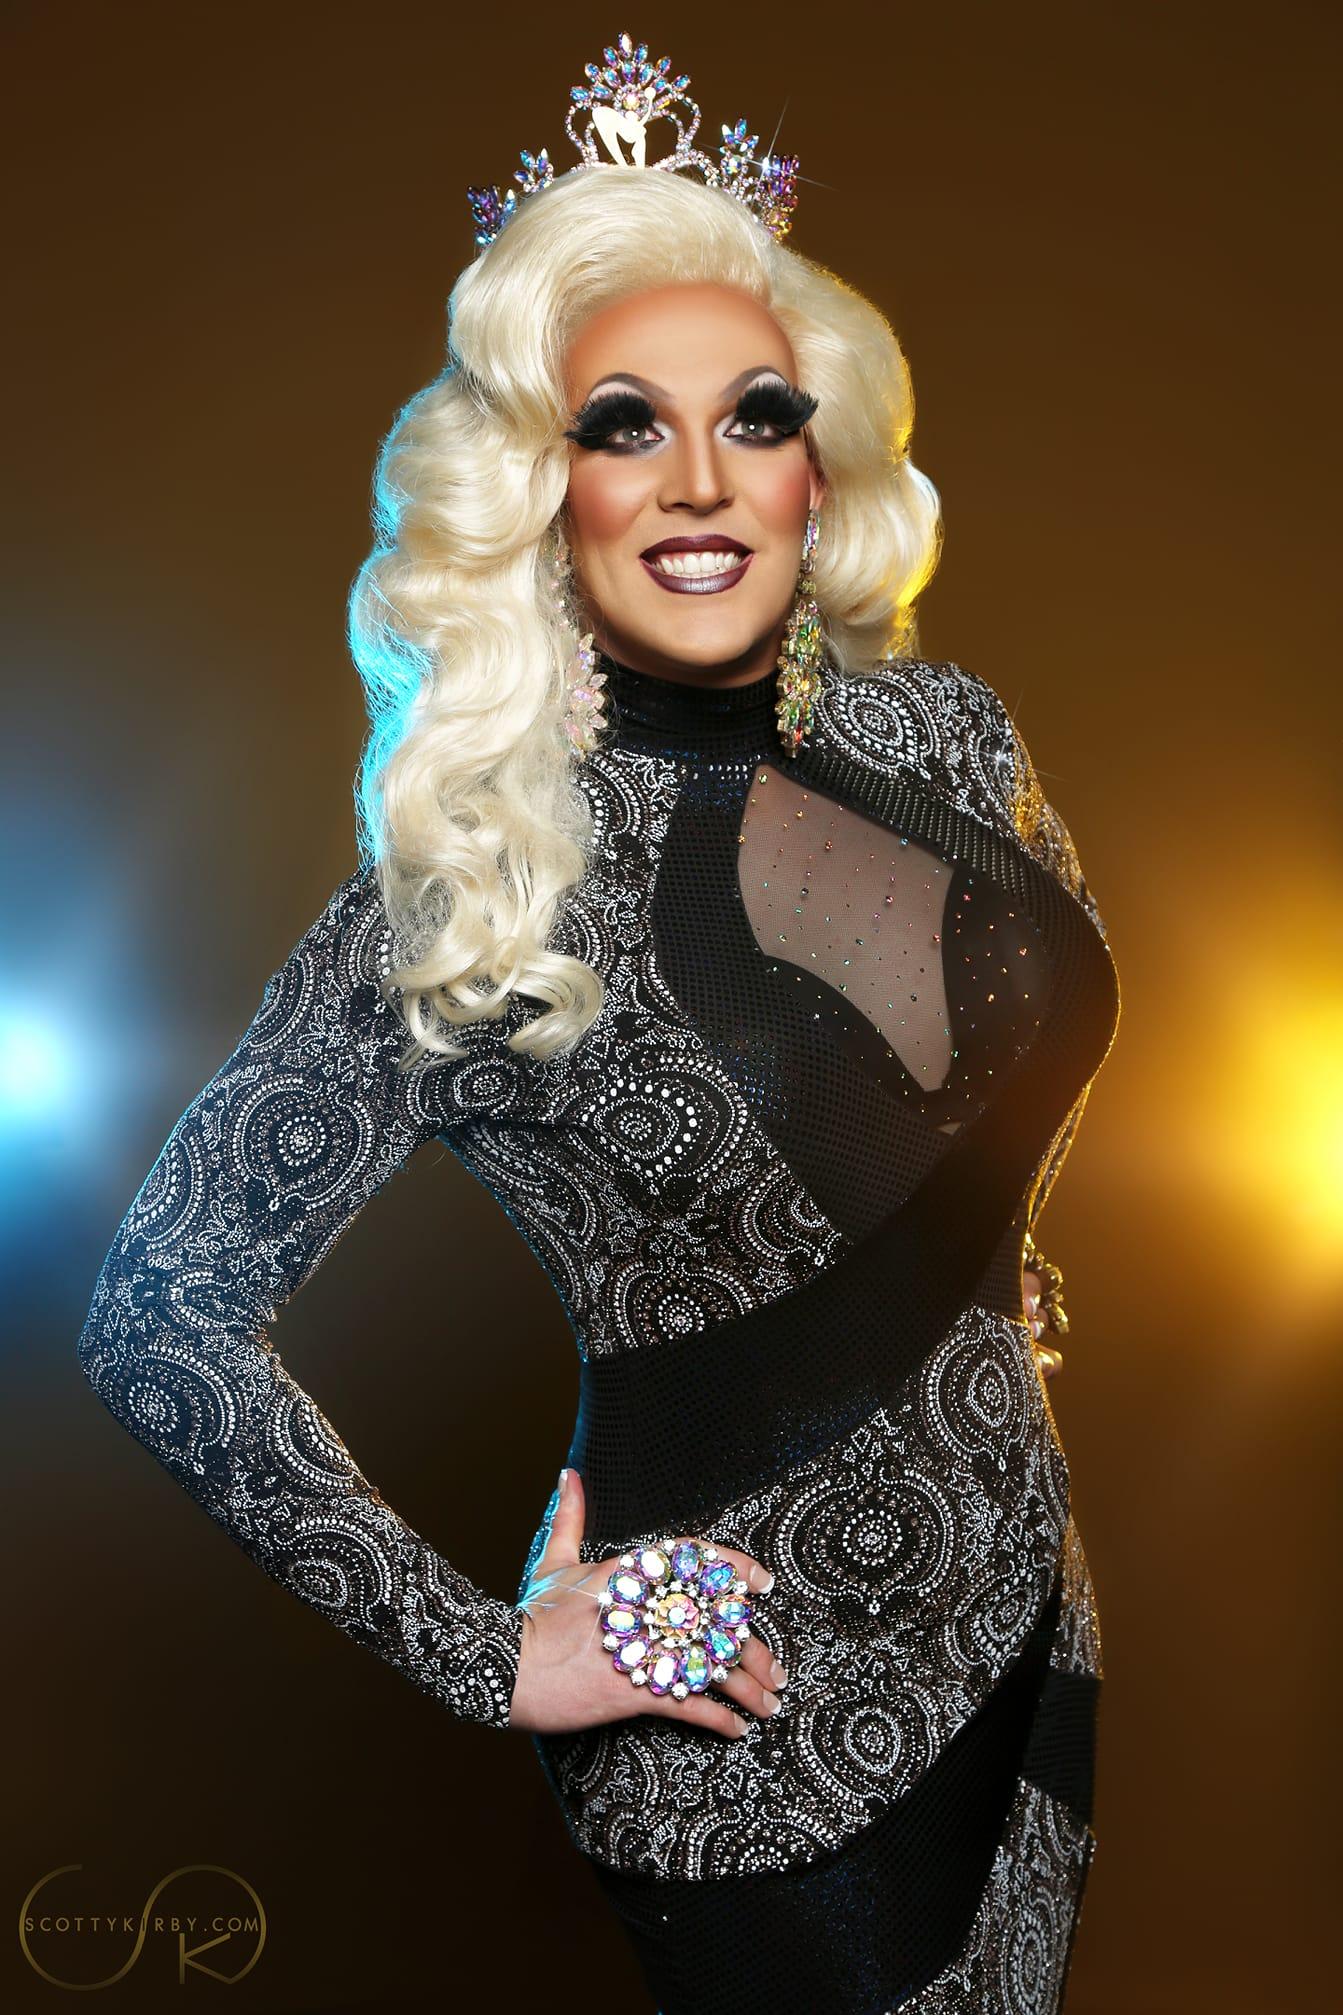 Valerie Taylor - Photo by Scotty Kirby